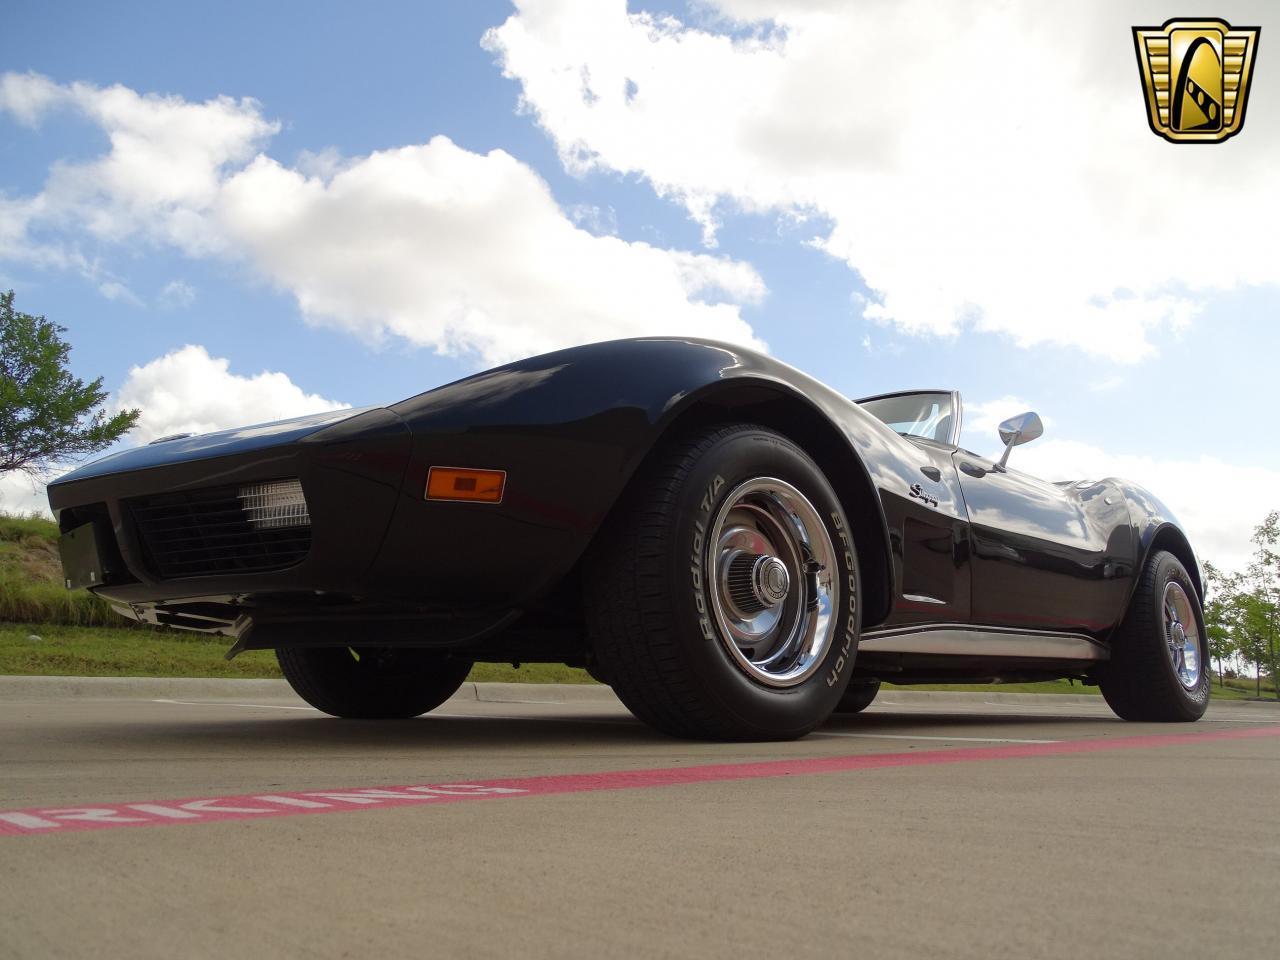 Large Picture of 1974 Corvette located in DFW Airport Texas - LAOQ